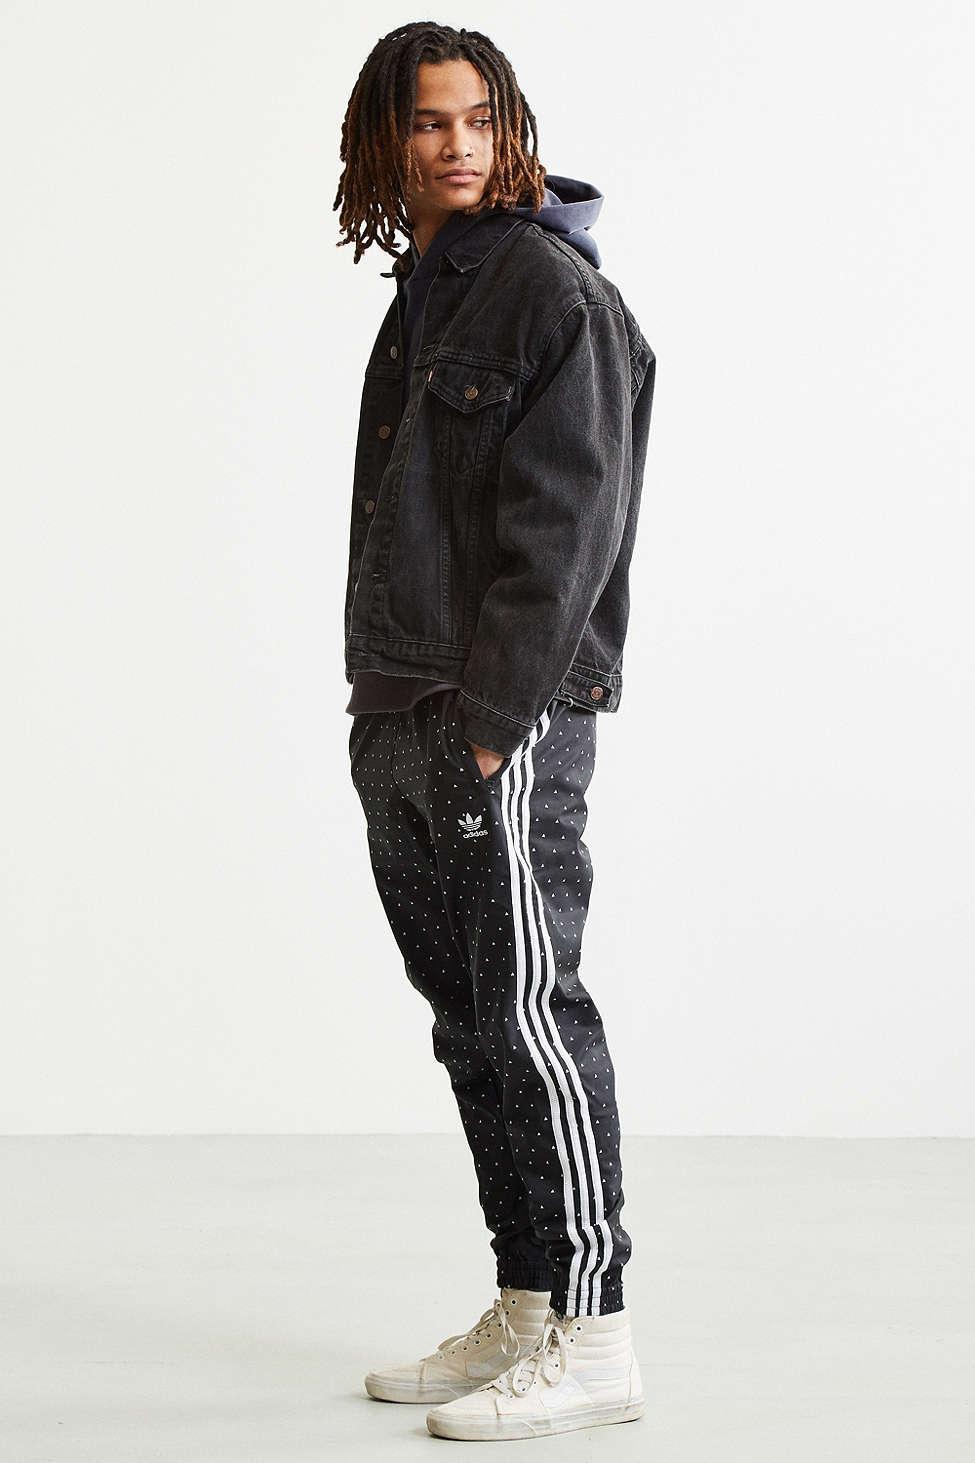 7d34c8efa Lyst - adidas Originals X Pharrell Williams Carrot Fit Track Pant in ...